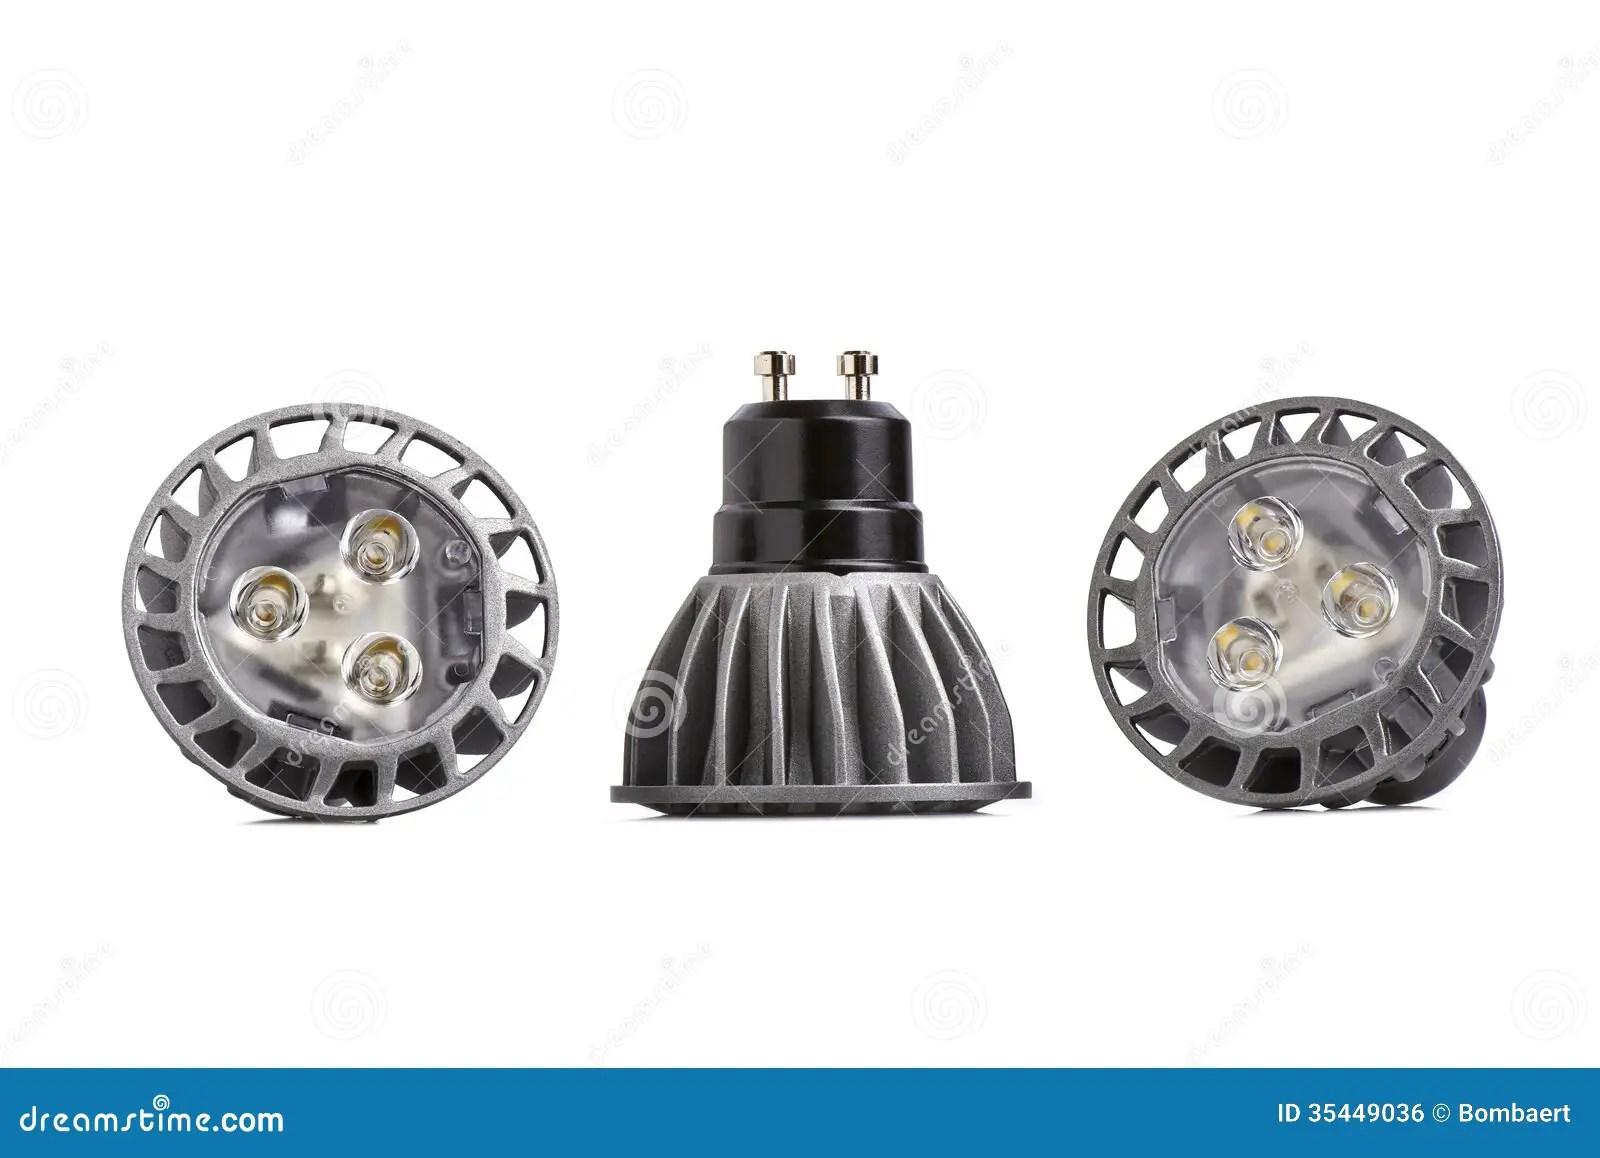 Energy Saving Led Light Bulb Royalty Free Stock Image